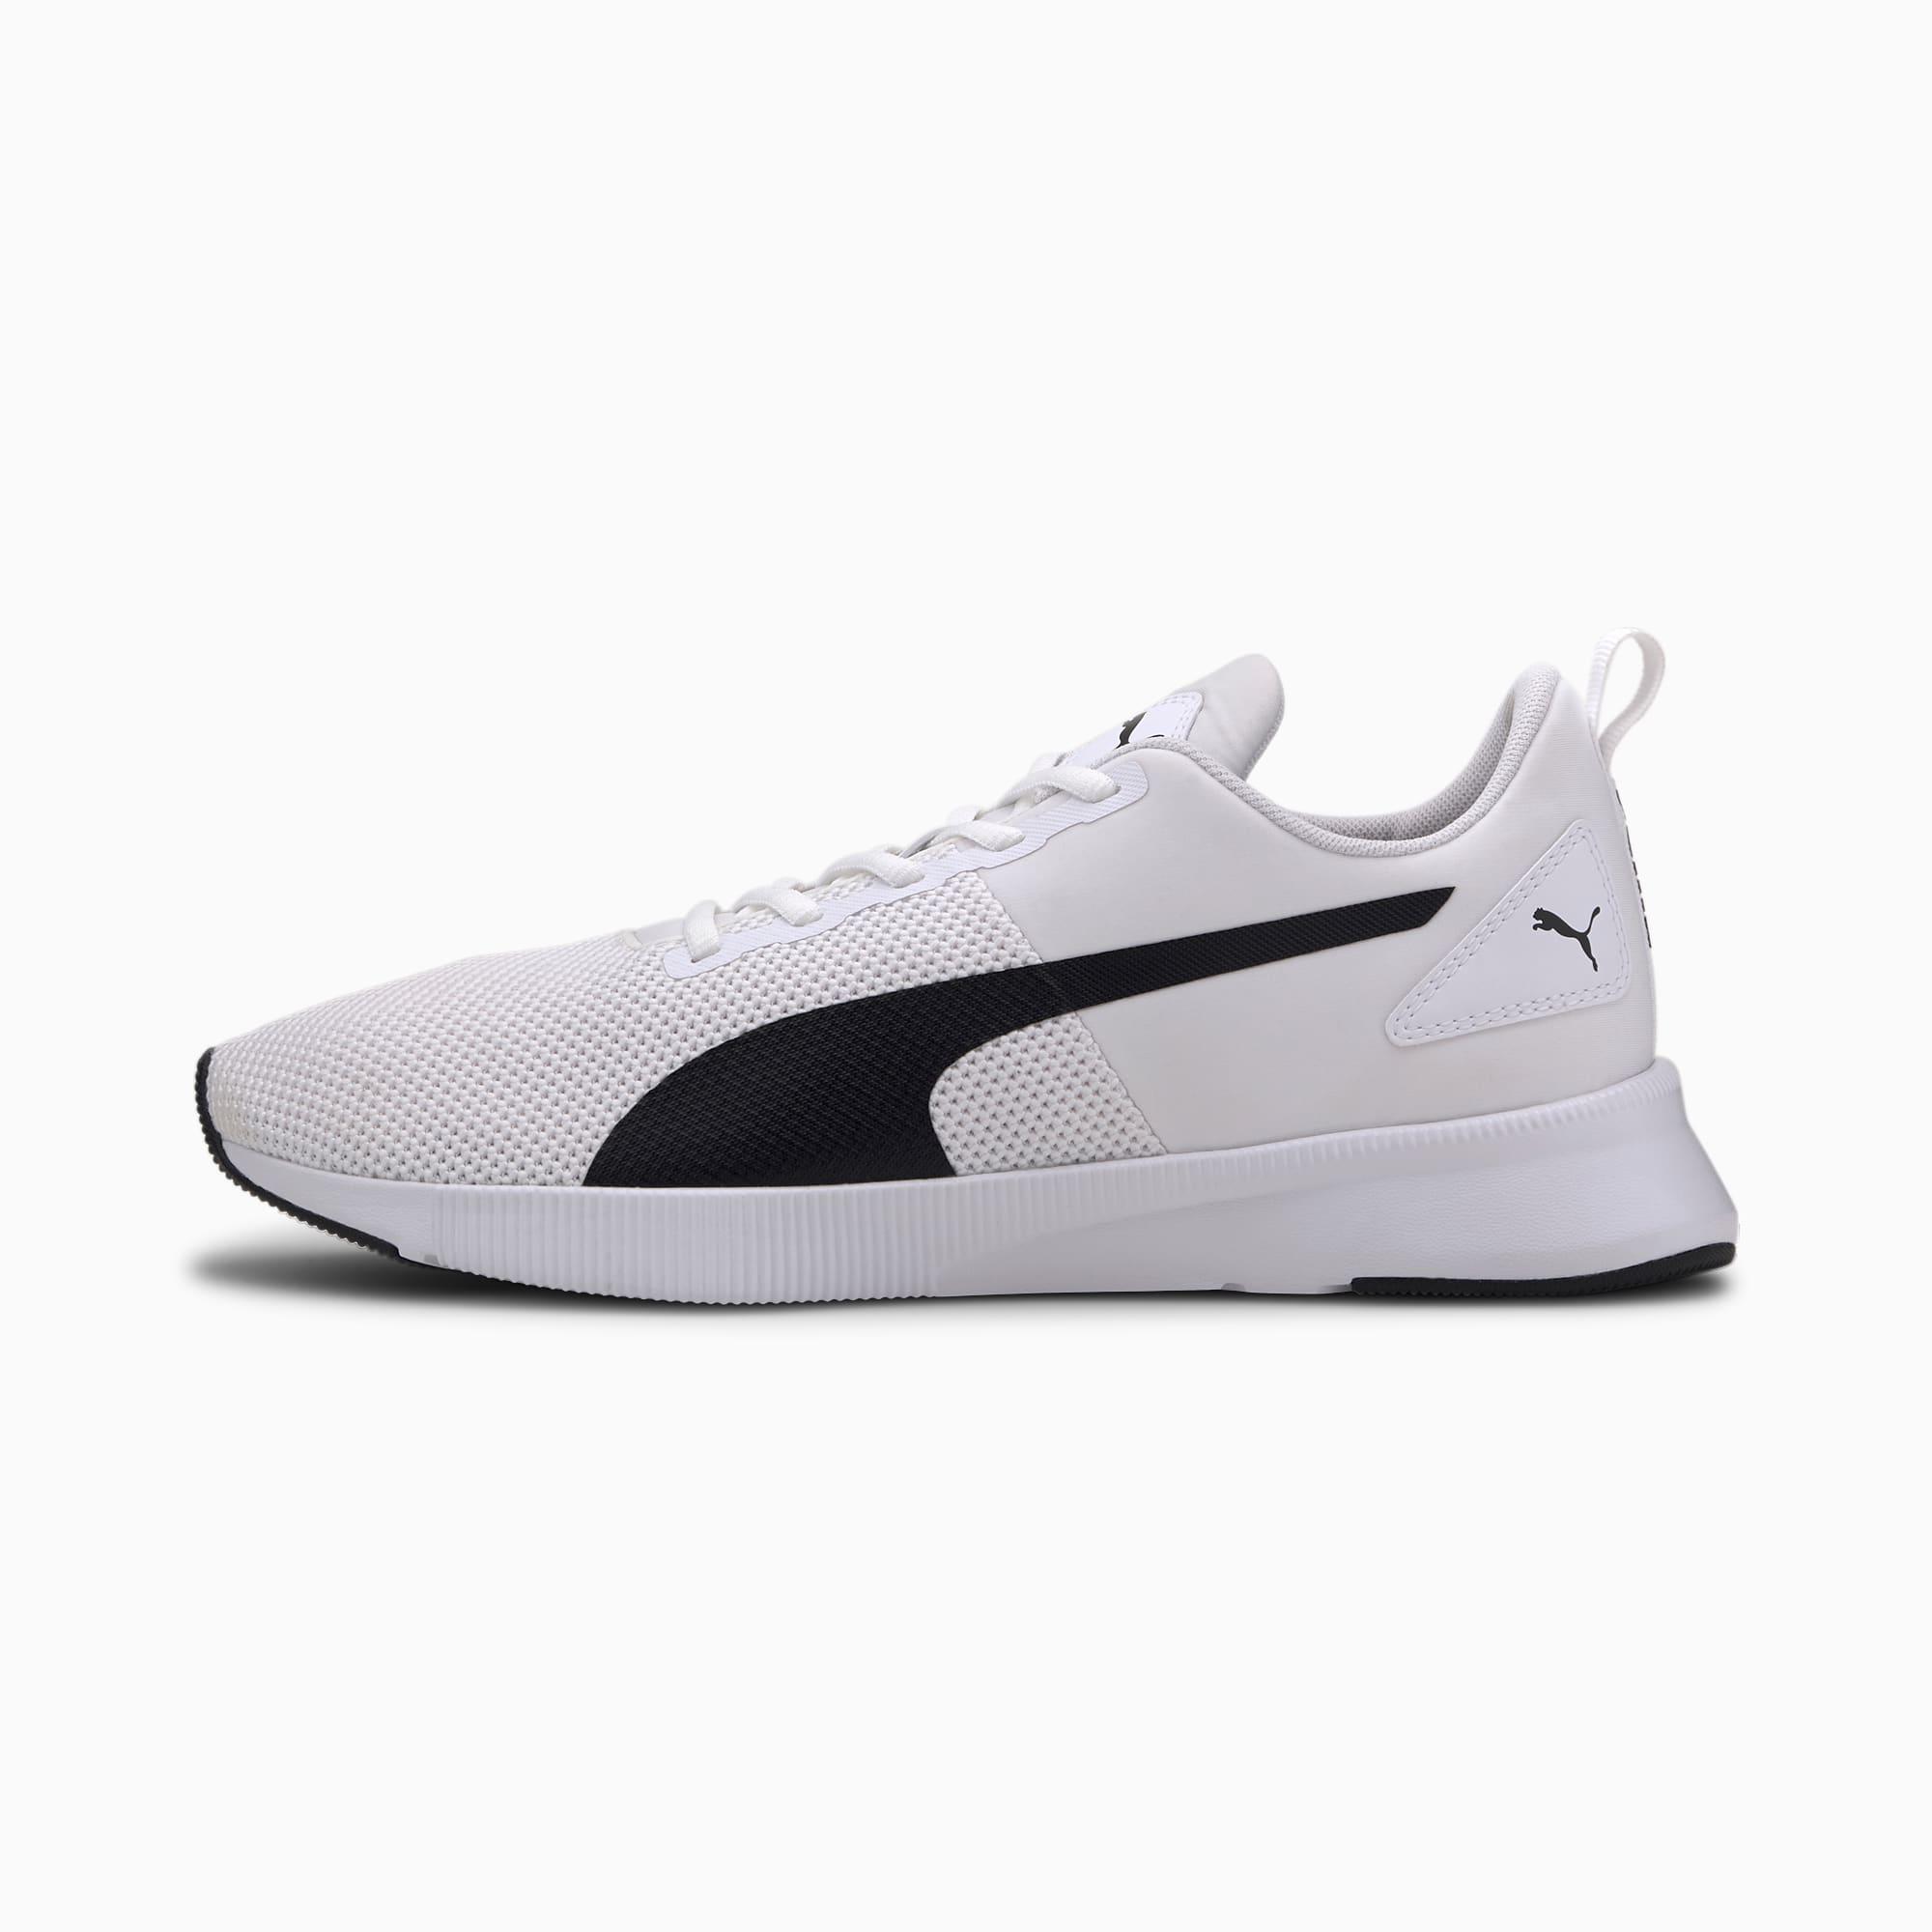 PUMA Chaussure de course Flyer Runner, Blanc/Noir, Taille 38, Chaussures